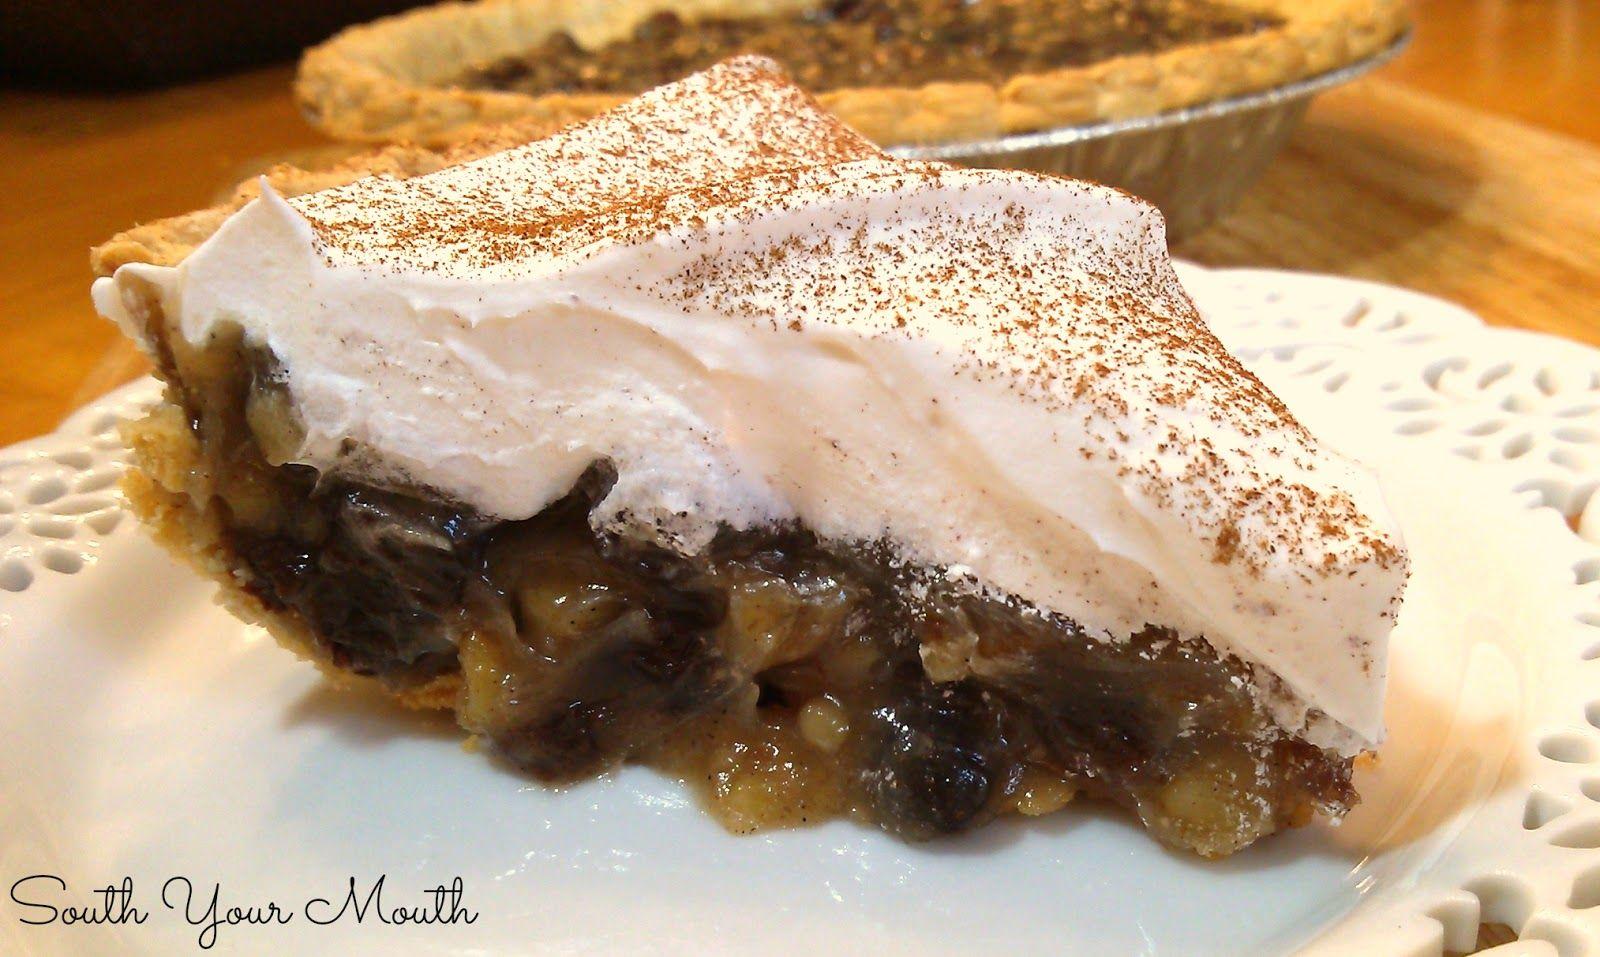 Sour Cream Raisin Pie Recipe Paula Deen Feels Free To Follow Us In 2020 Sour Cream Raisin Pie Raisin Pie Raisin Pie Recipe